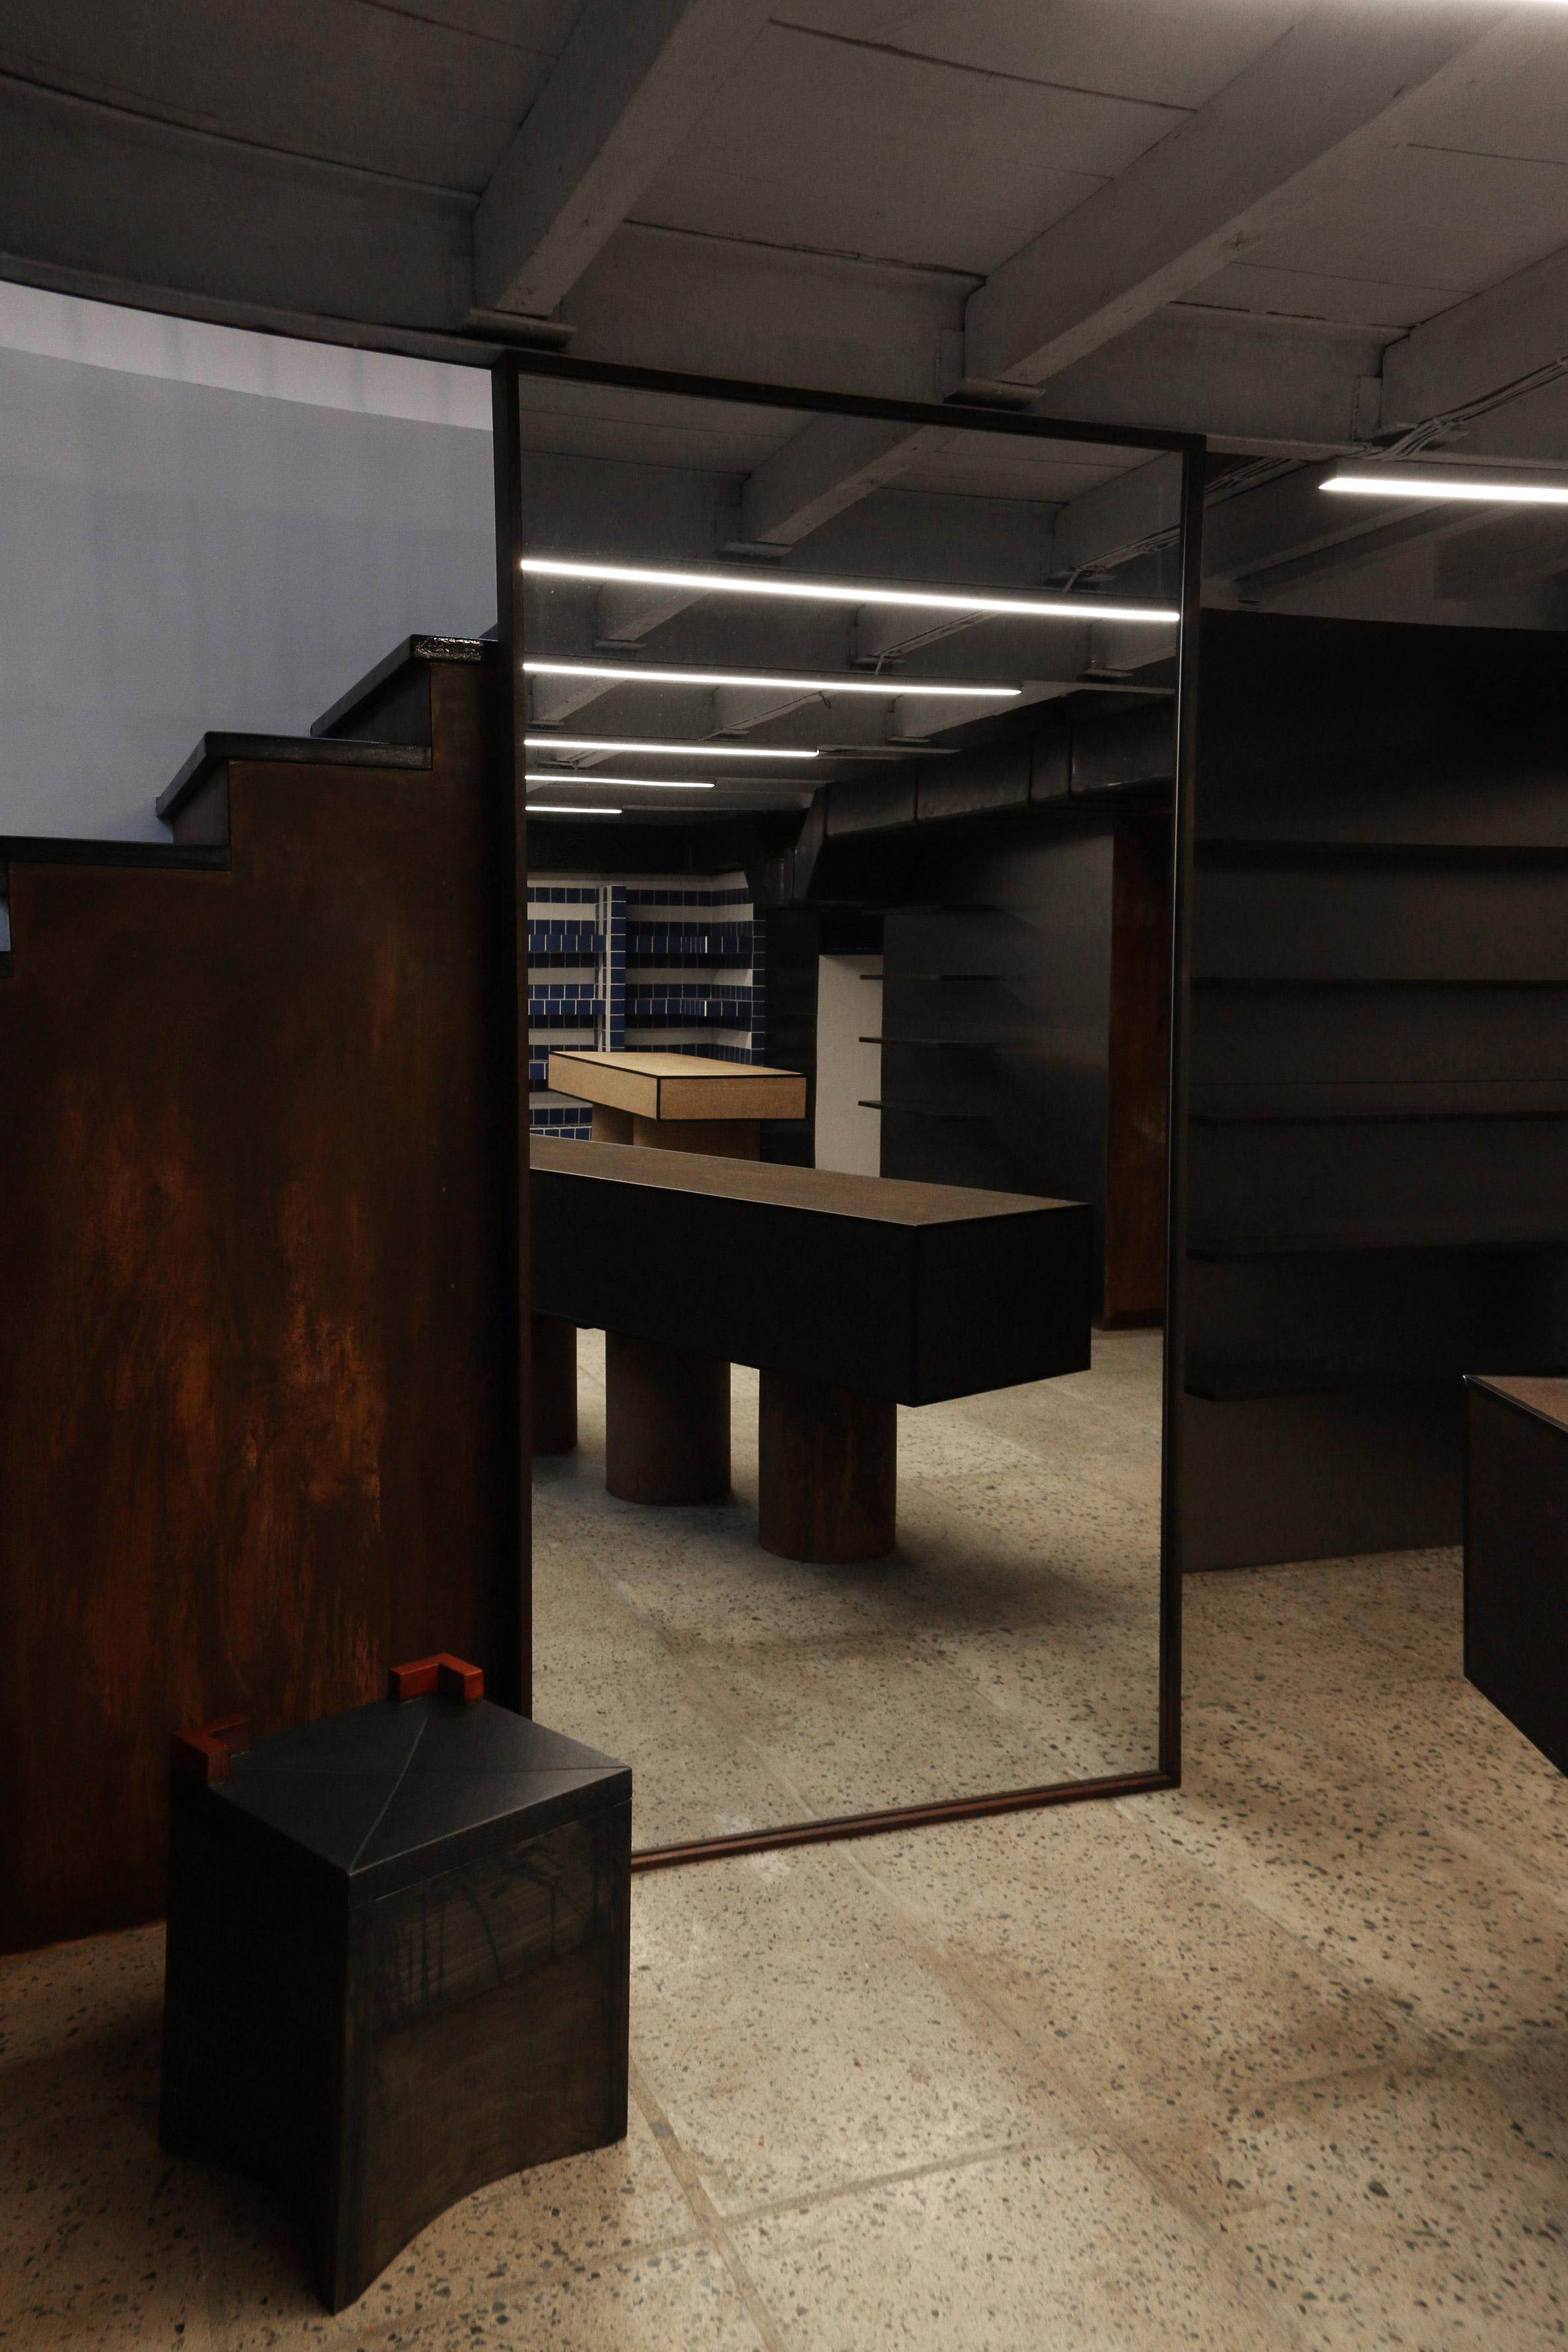 Interiors of They Said Books shop, designed by Lado Lomitashvili